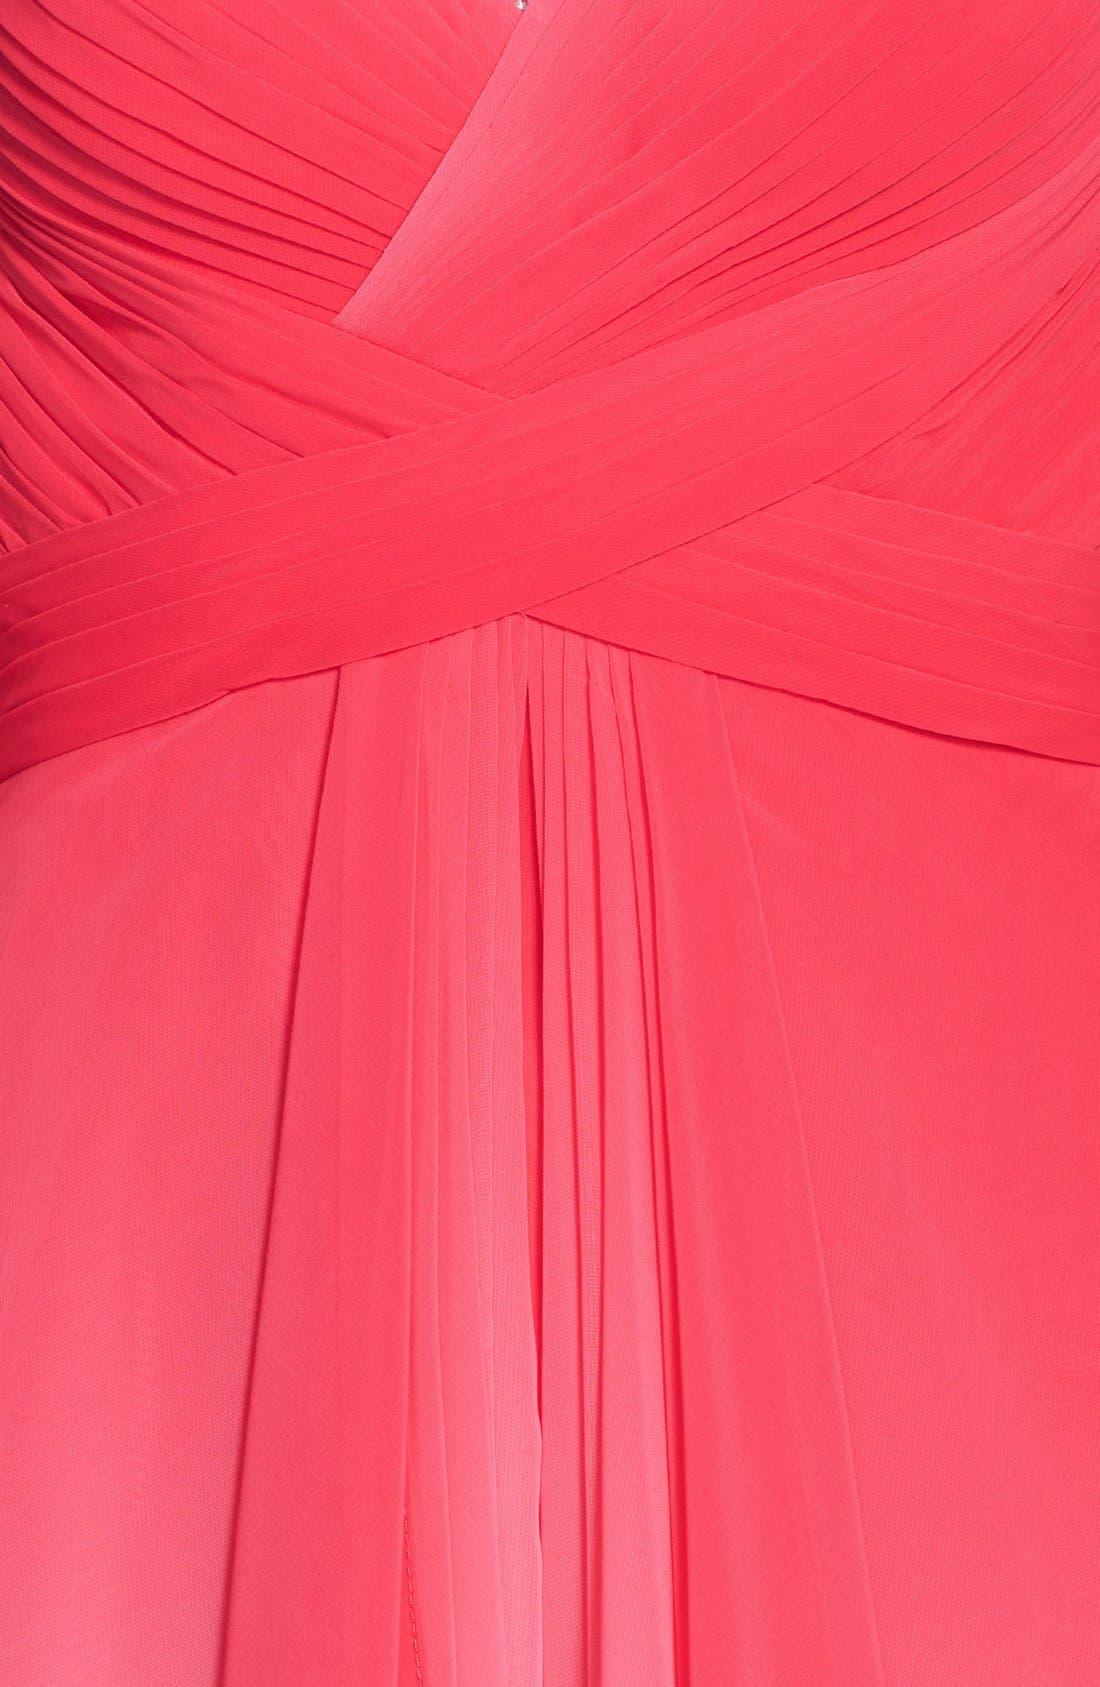 Alternate Image 3  - La Femme Embellished Ombré Tiered Chiffon Gown